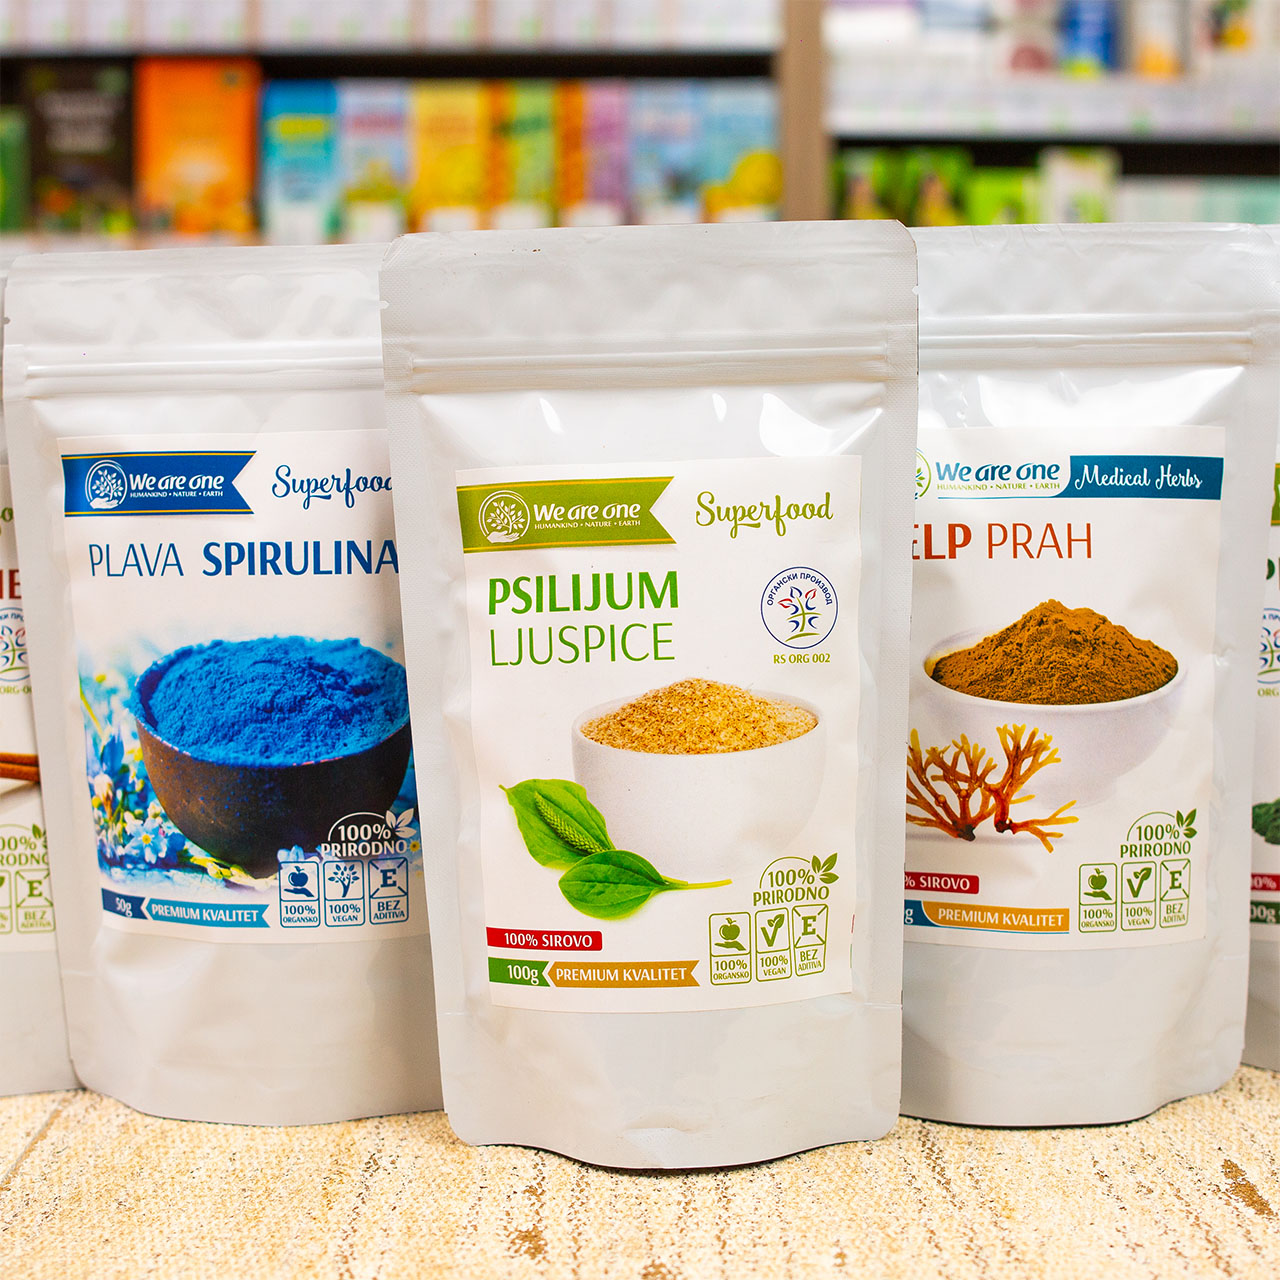 Superfood We are One: Plava spirulina, Psilijum ljuspice, Kelp prah